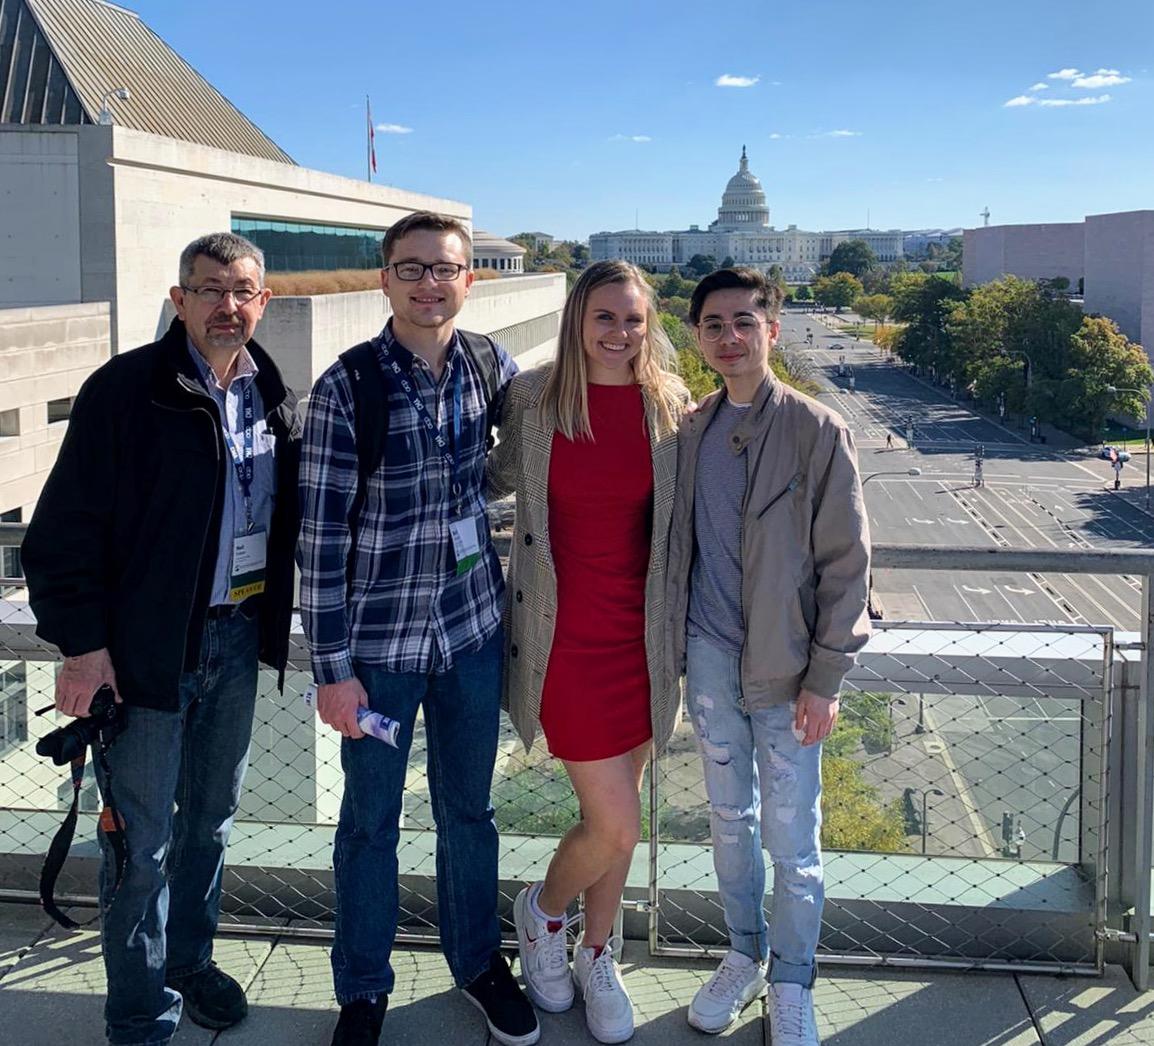 From left, Lindenlink's advisor Neil Ralston poses with Matt Hampton, Kayla Drake and Tyler Keohane in Washington D.C.